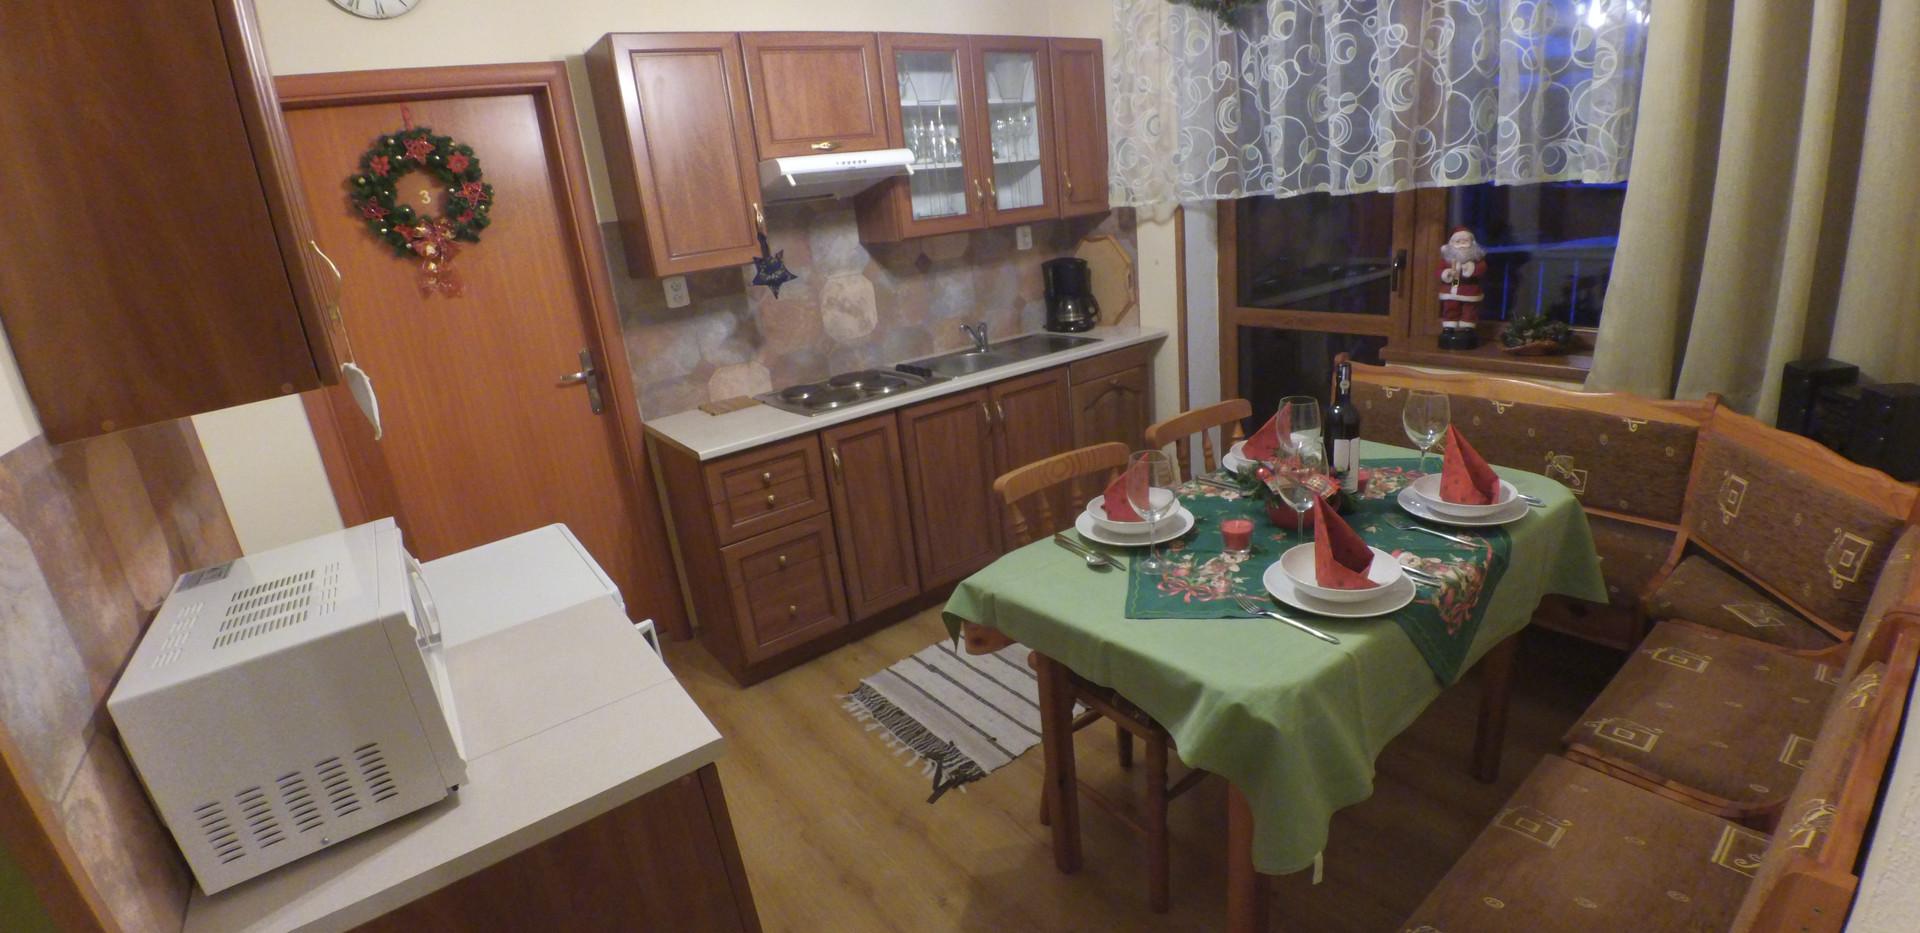 kuchyna deluxe 2.jpg